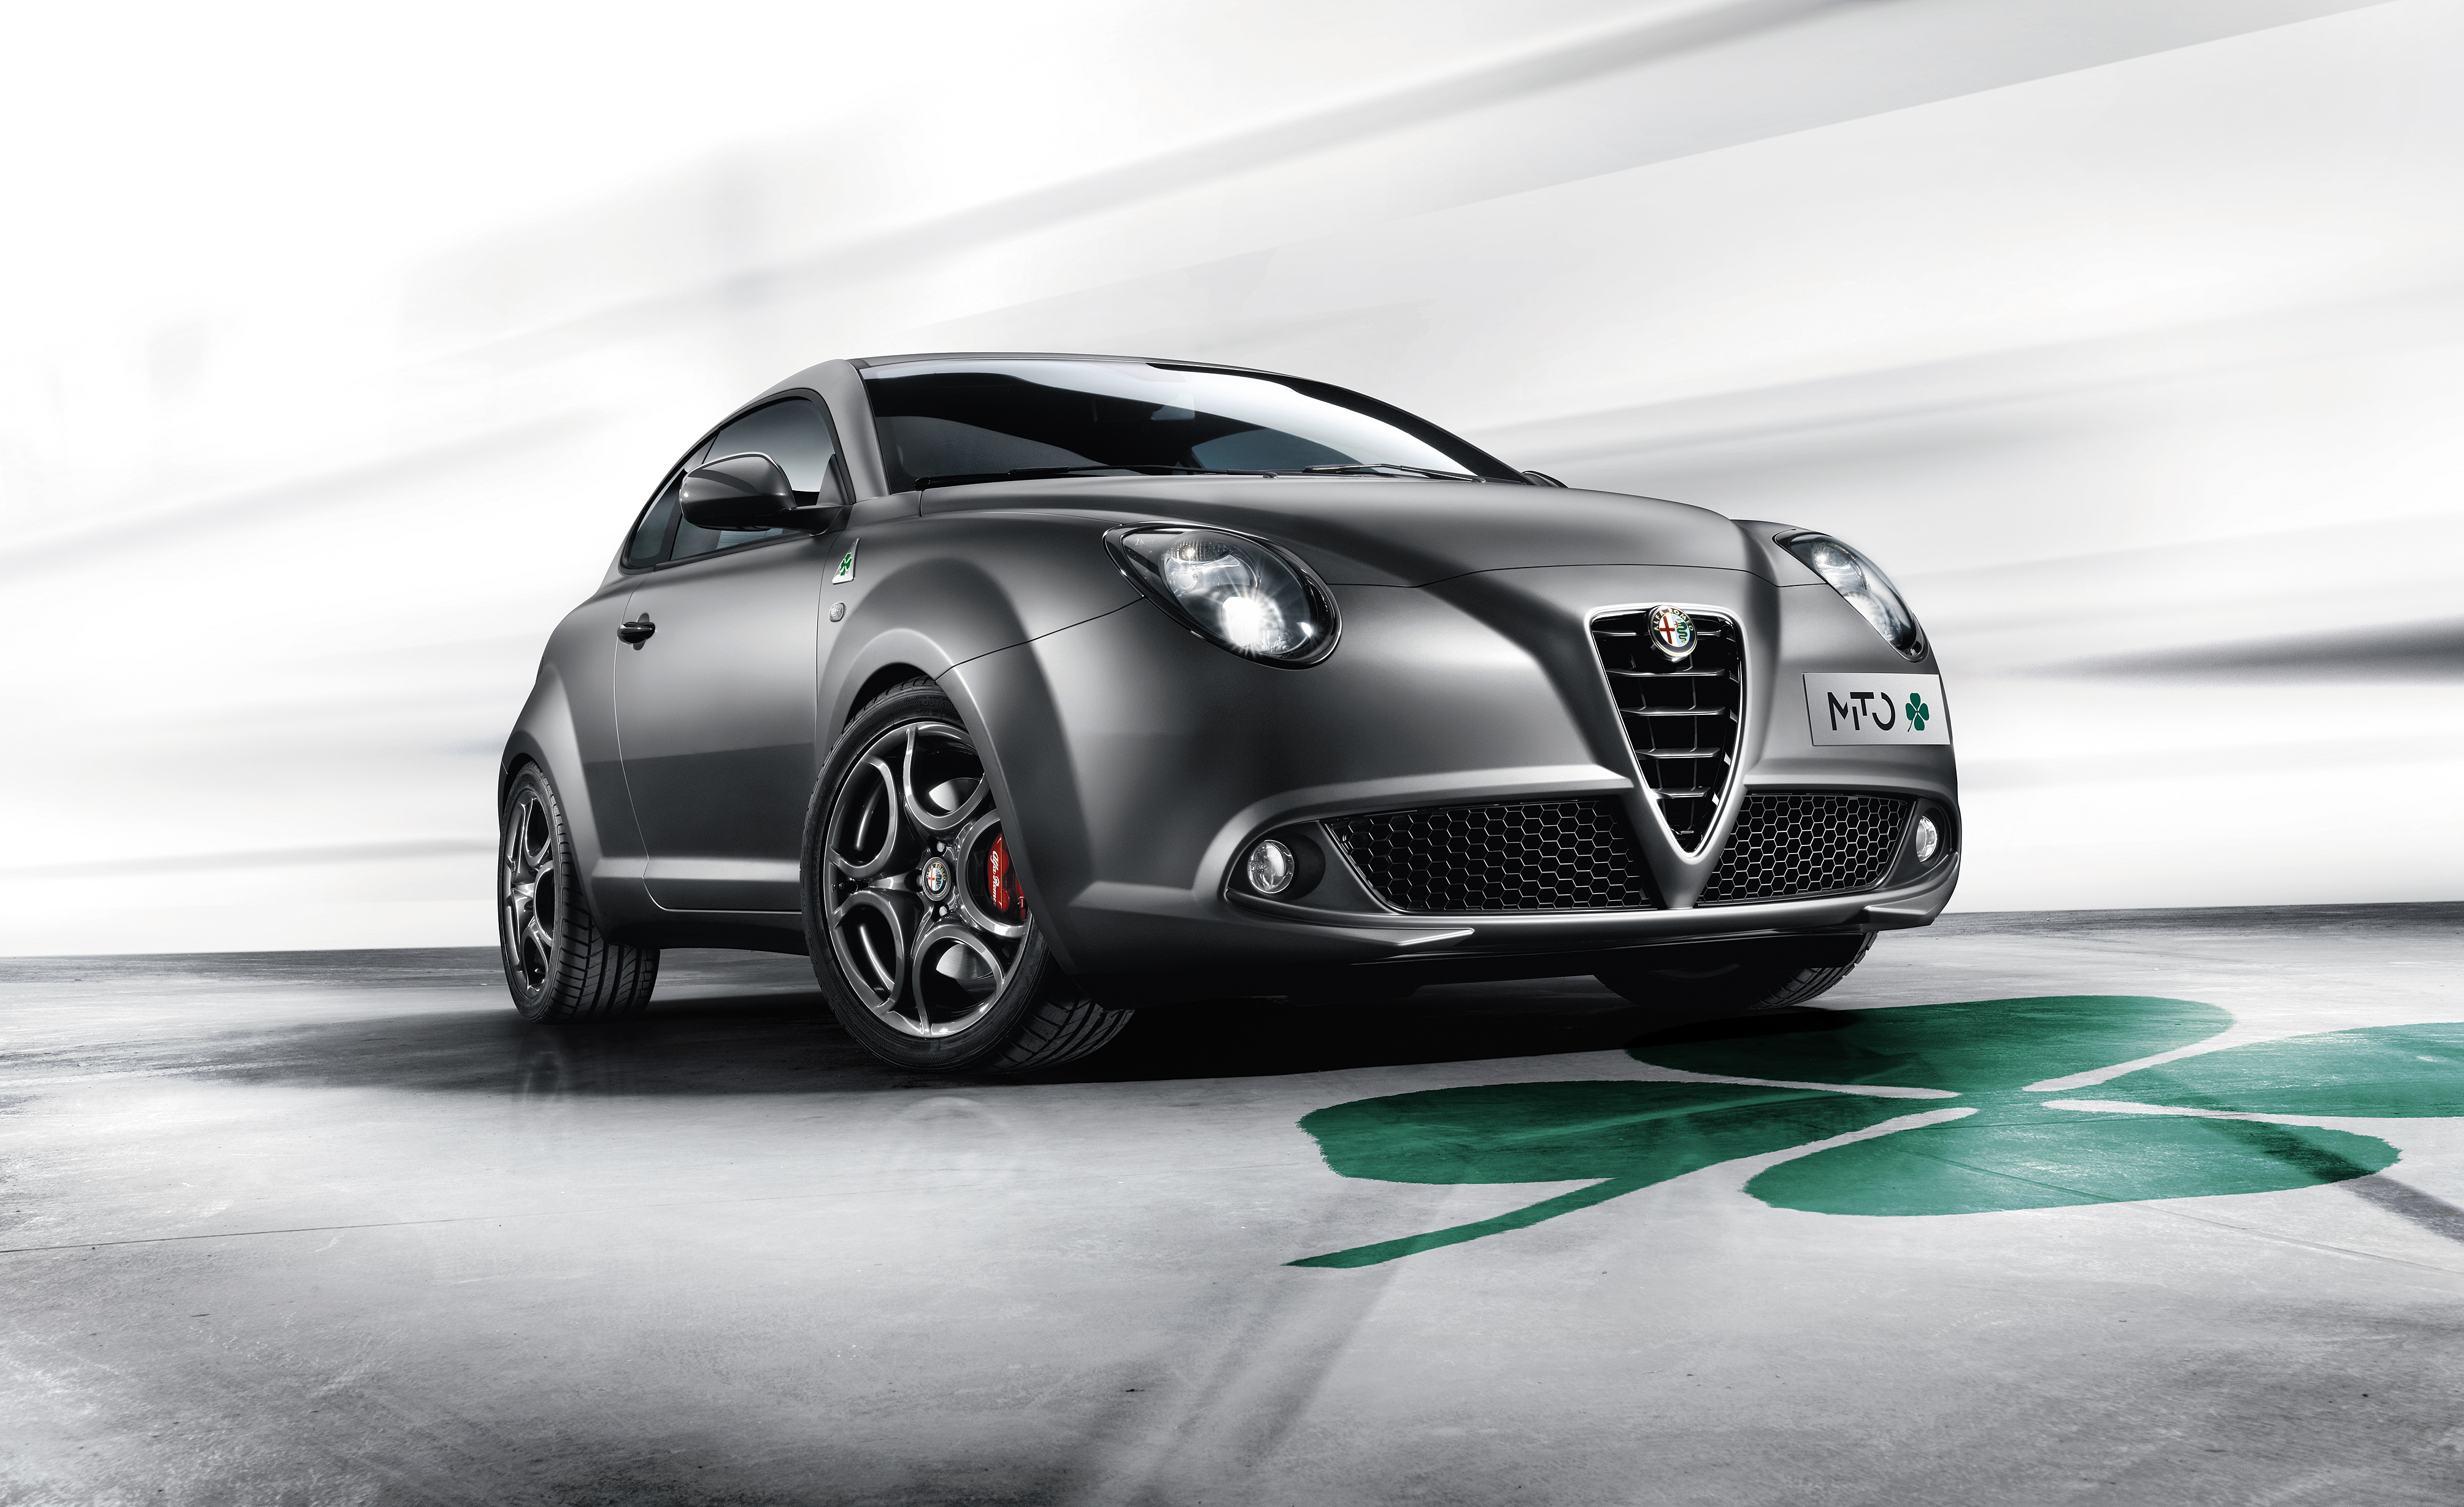 alfa romeo wallpaper (Alfa Romeo MiTo)